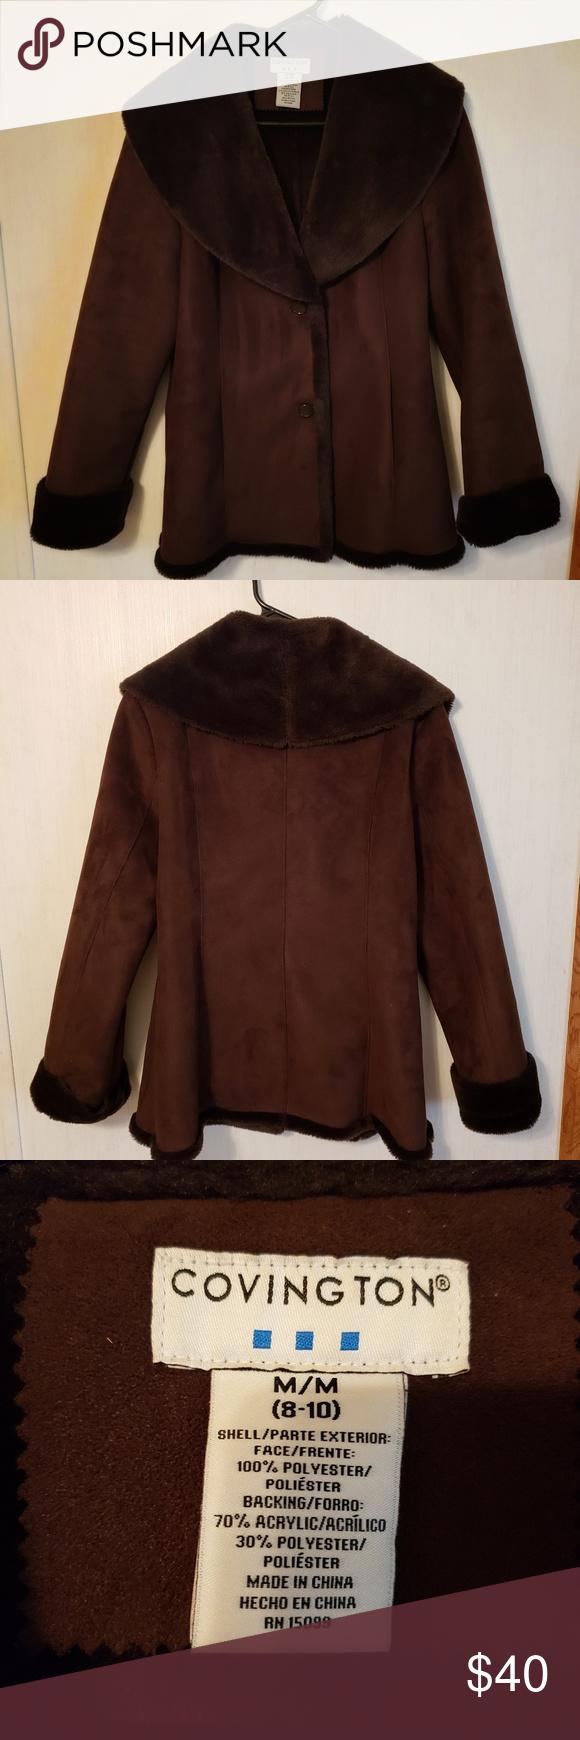 Covington Faux Fur Coat Like New Fantastic Condition Brown Very Warm Size Medium Has Two Buttons On The Front Covi Faux Fur Coat Fur Coat Clothes Design [ 1740 x 580 Pixel ]